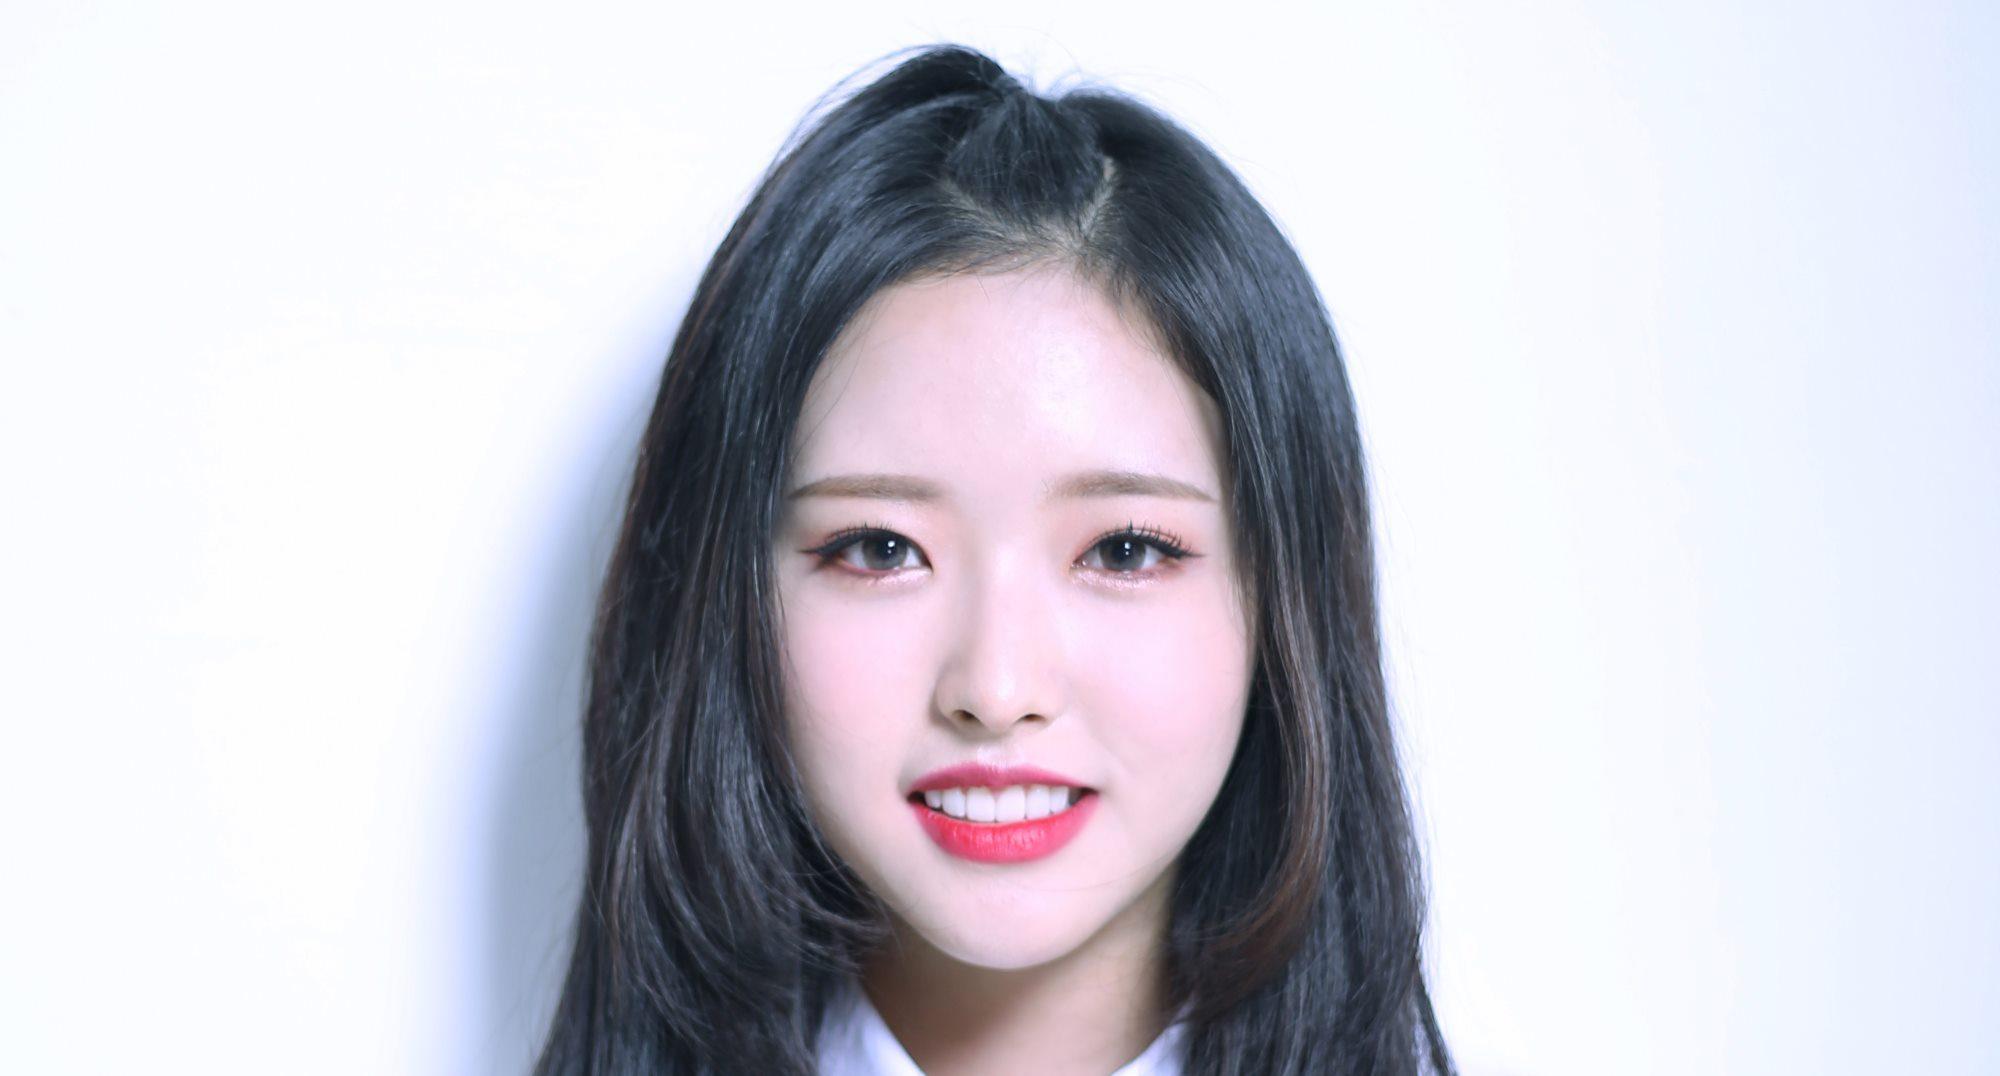 Loona Olivia Hye